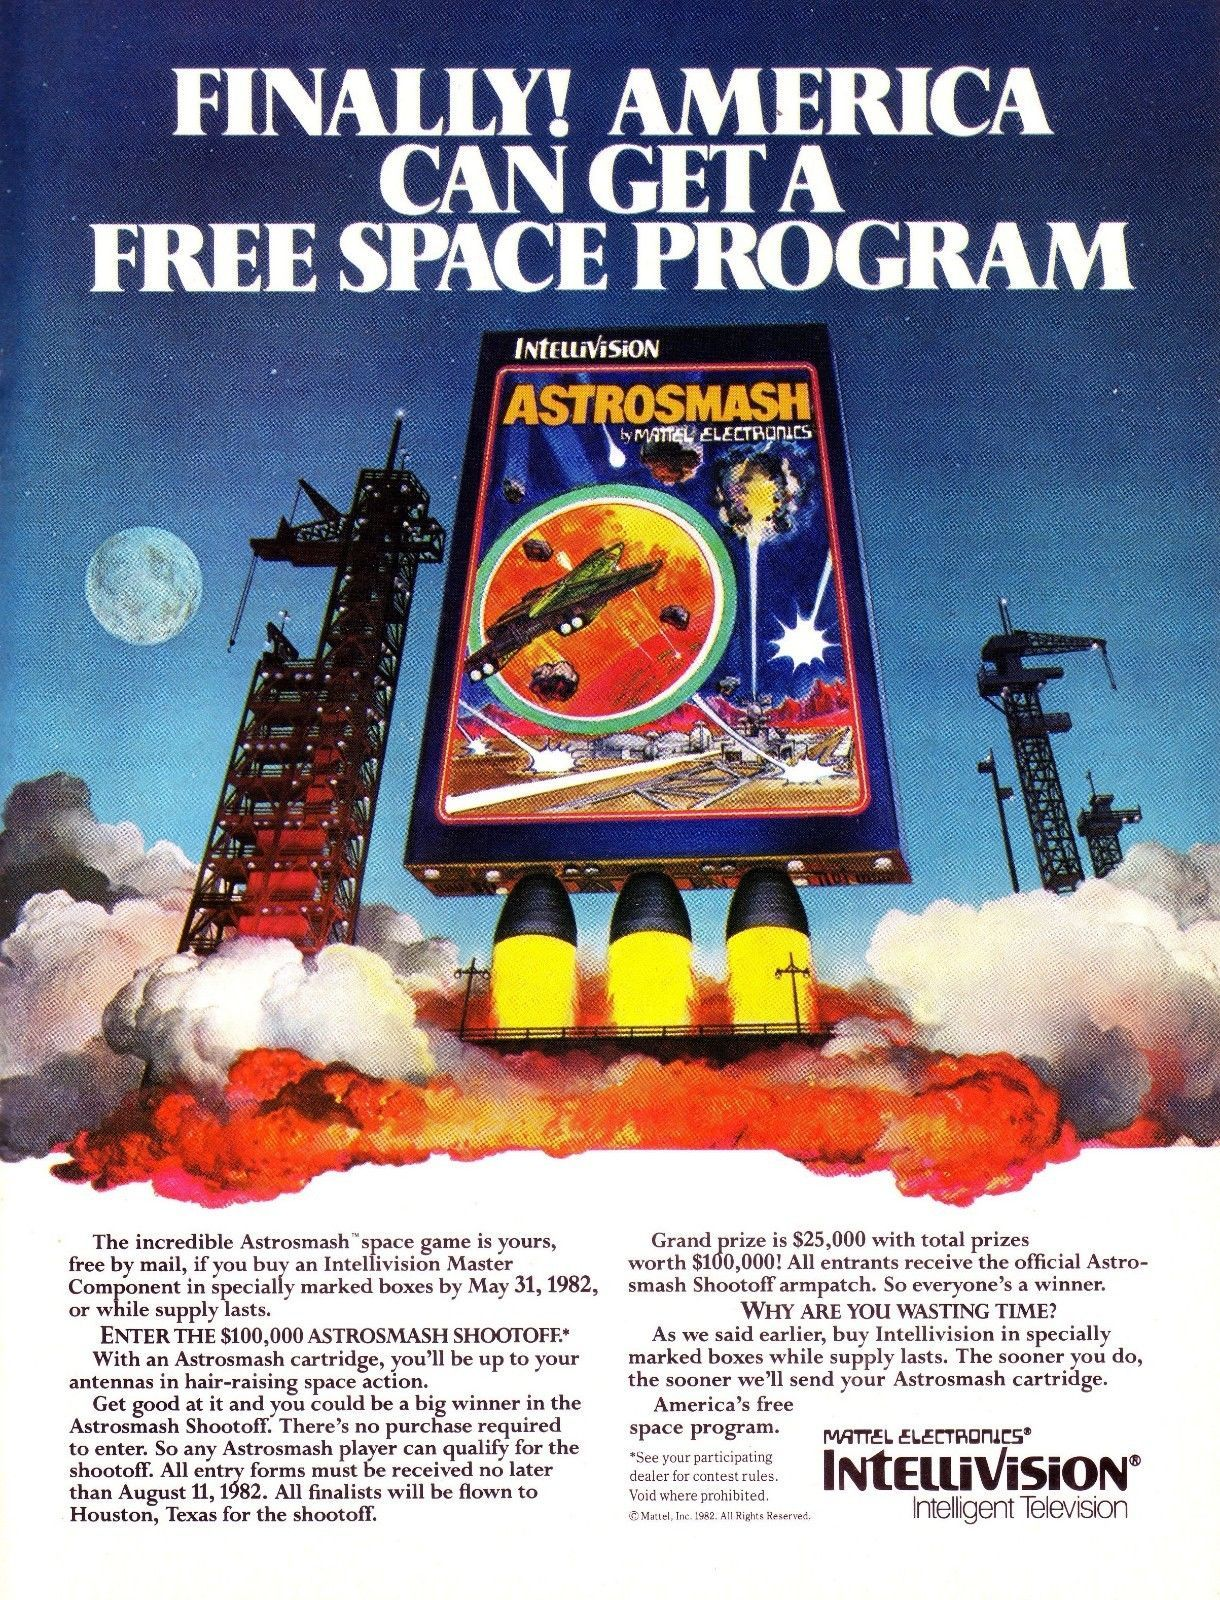 Mattel Intellivision Master Component Astrosmash video